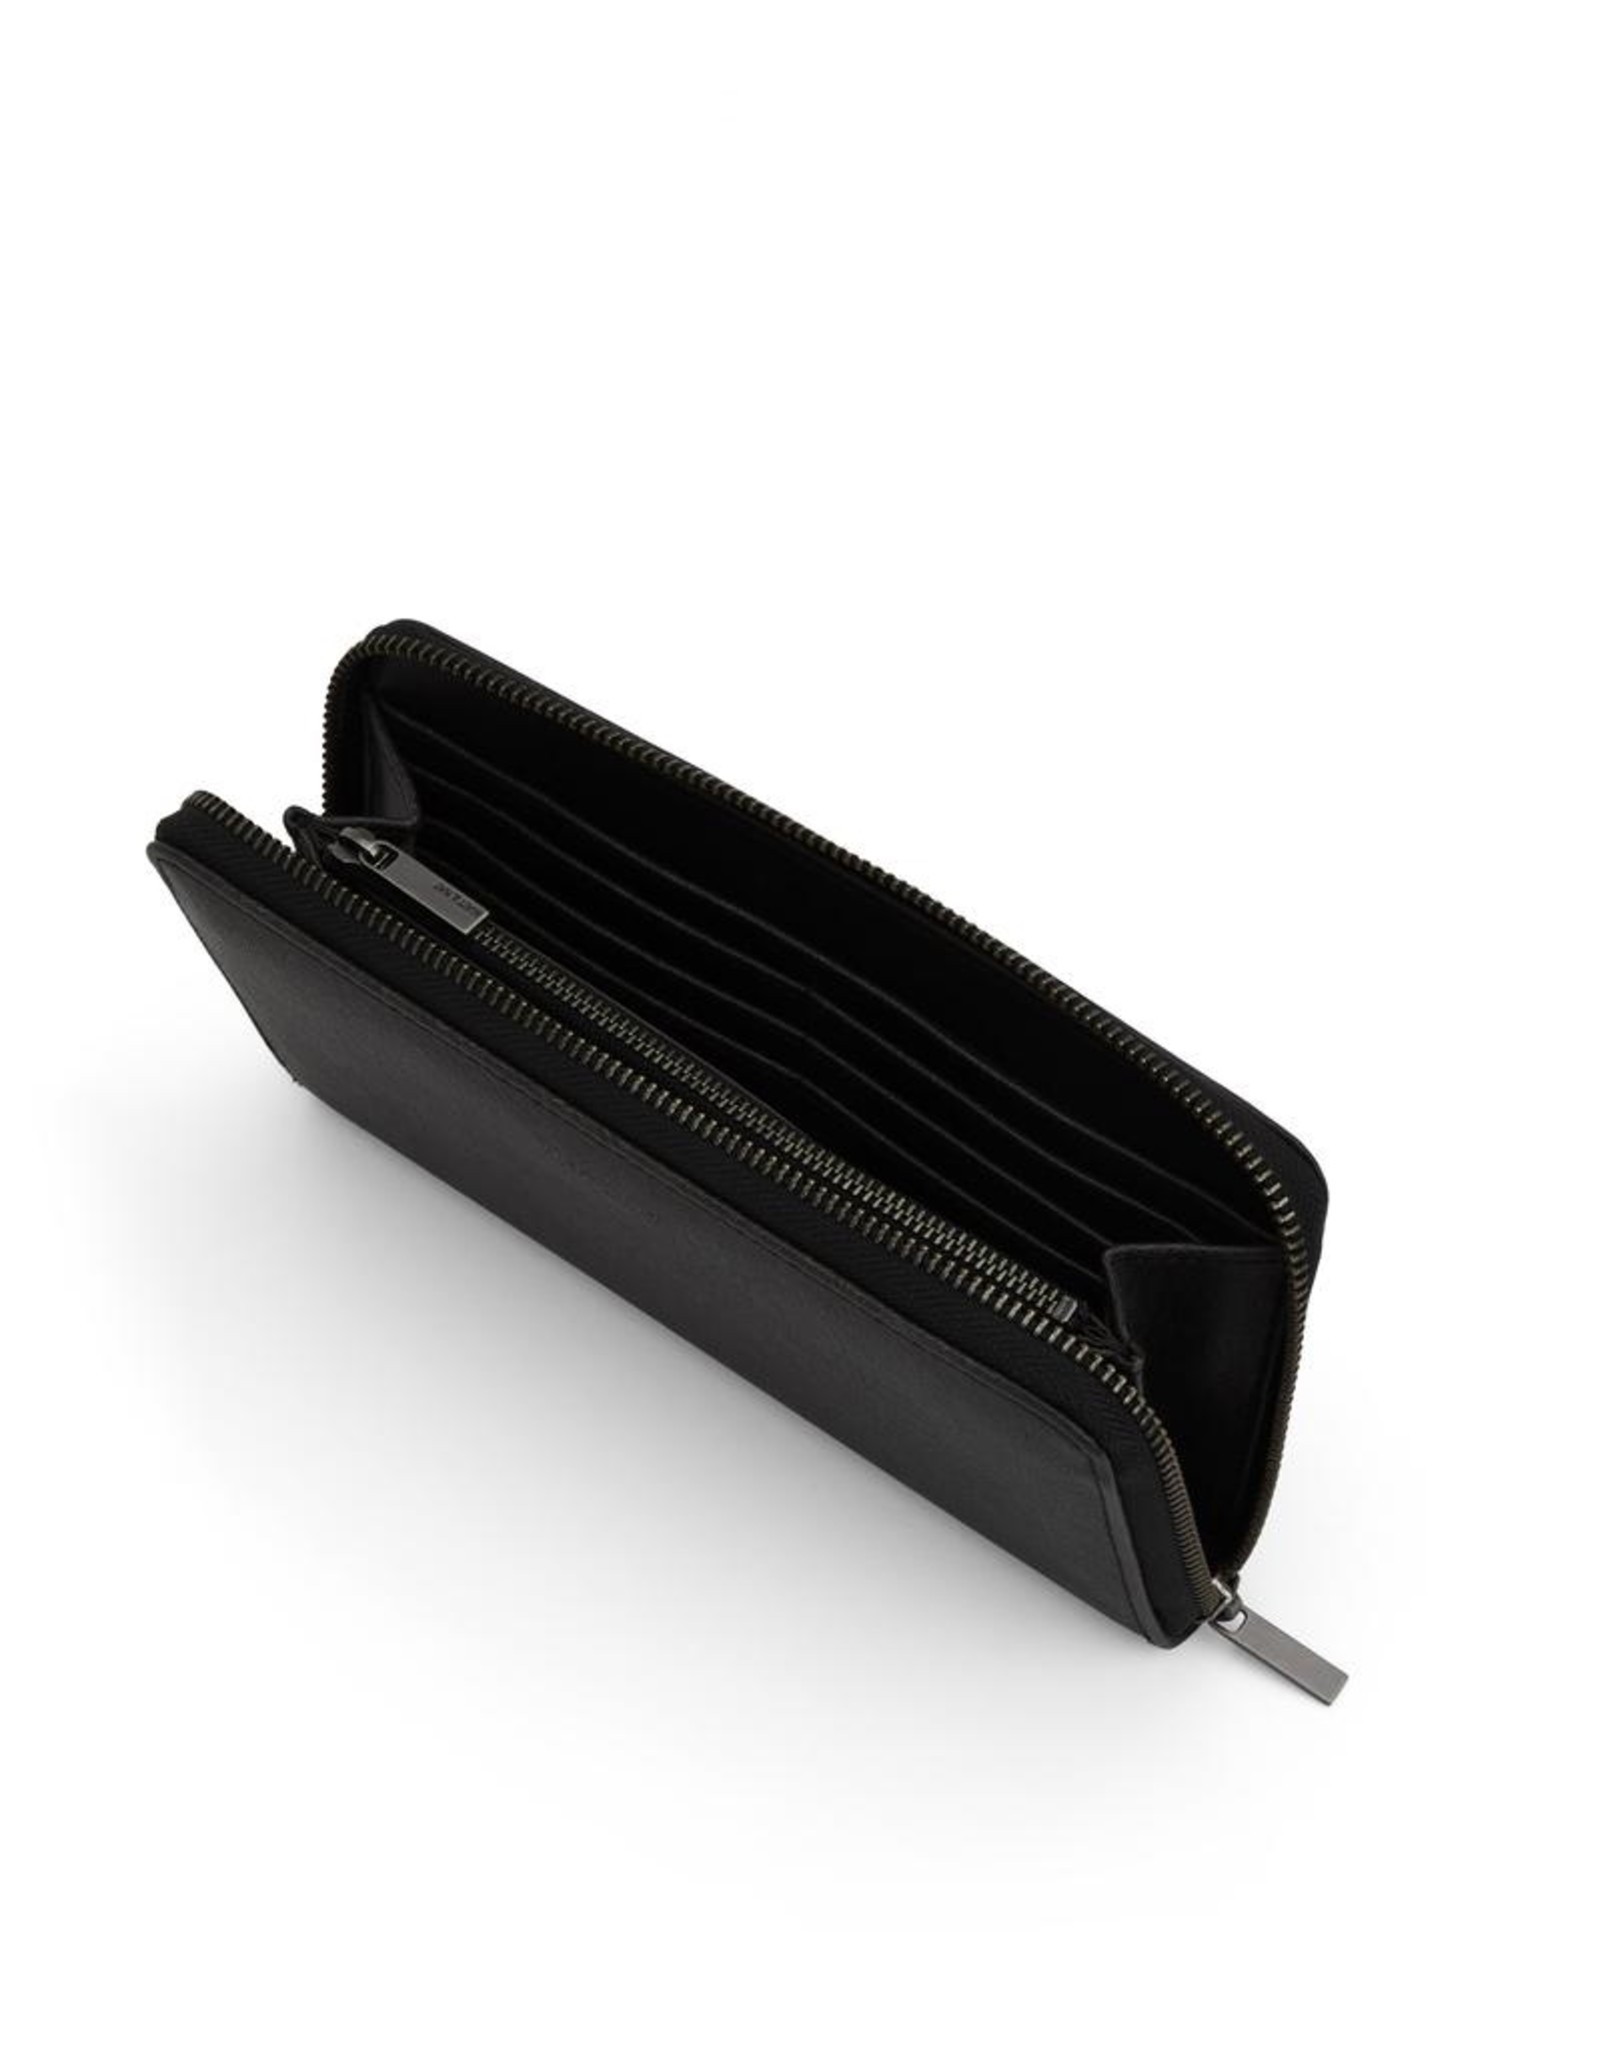 Matt & Nat - Wallet With Wrist Strap Elm/Black